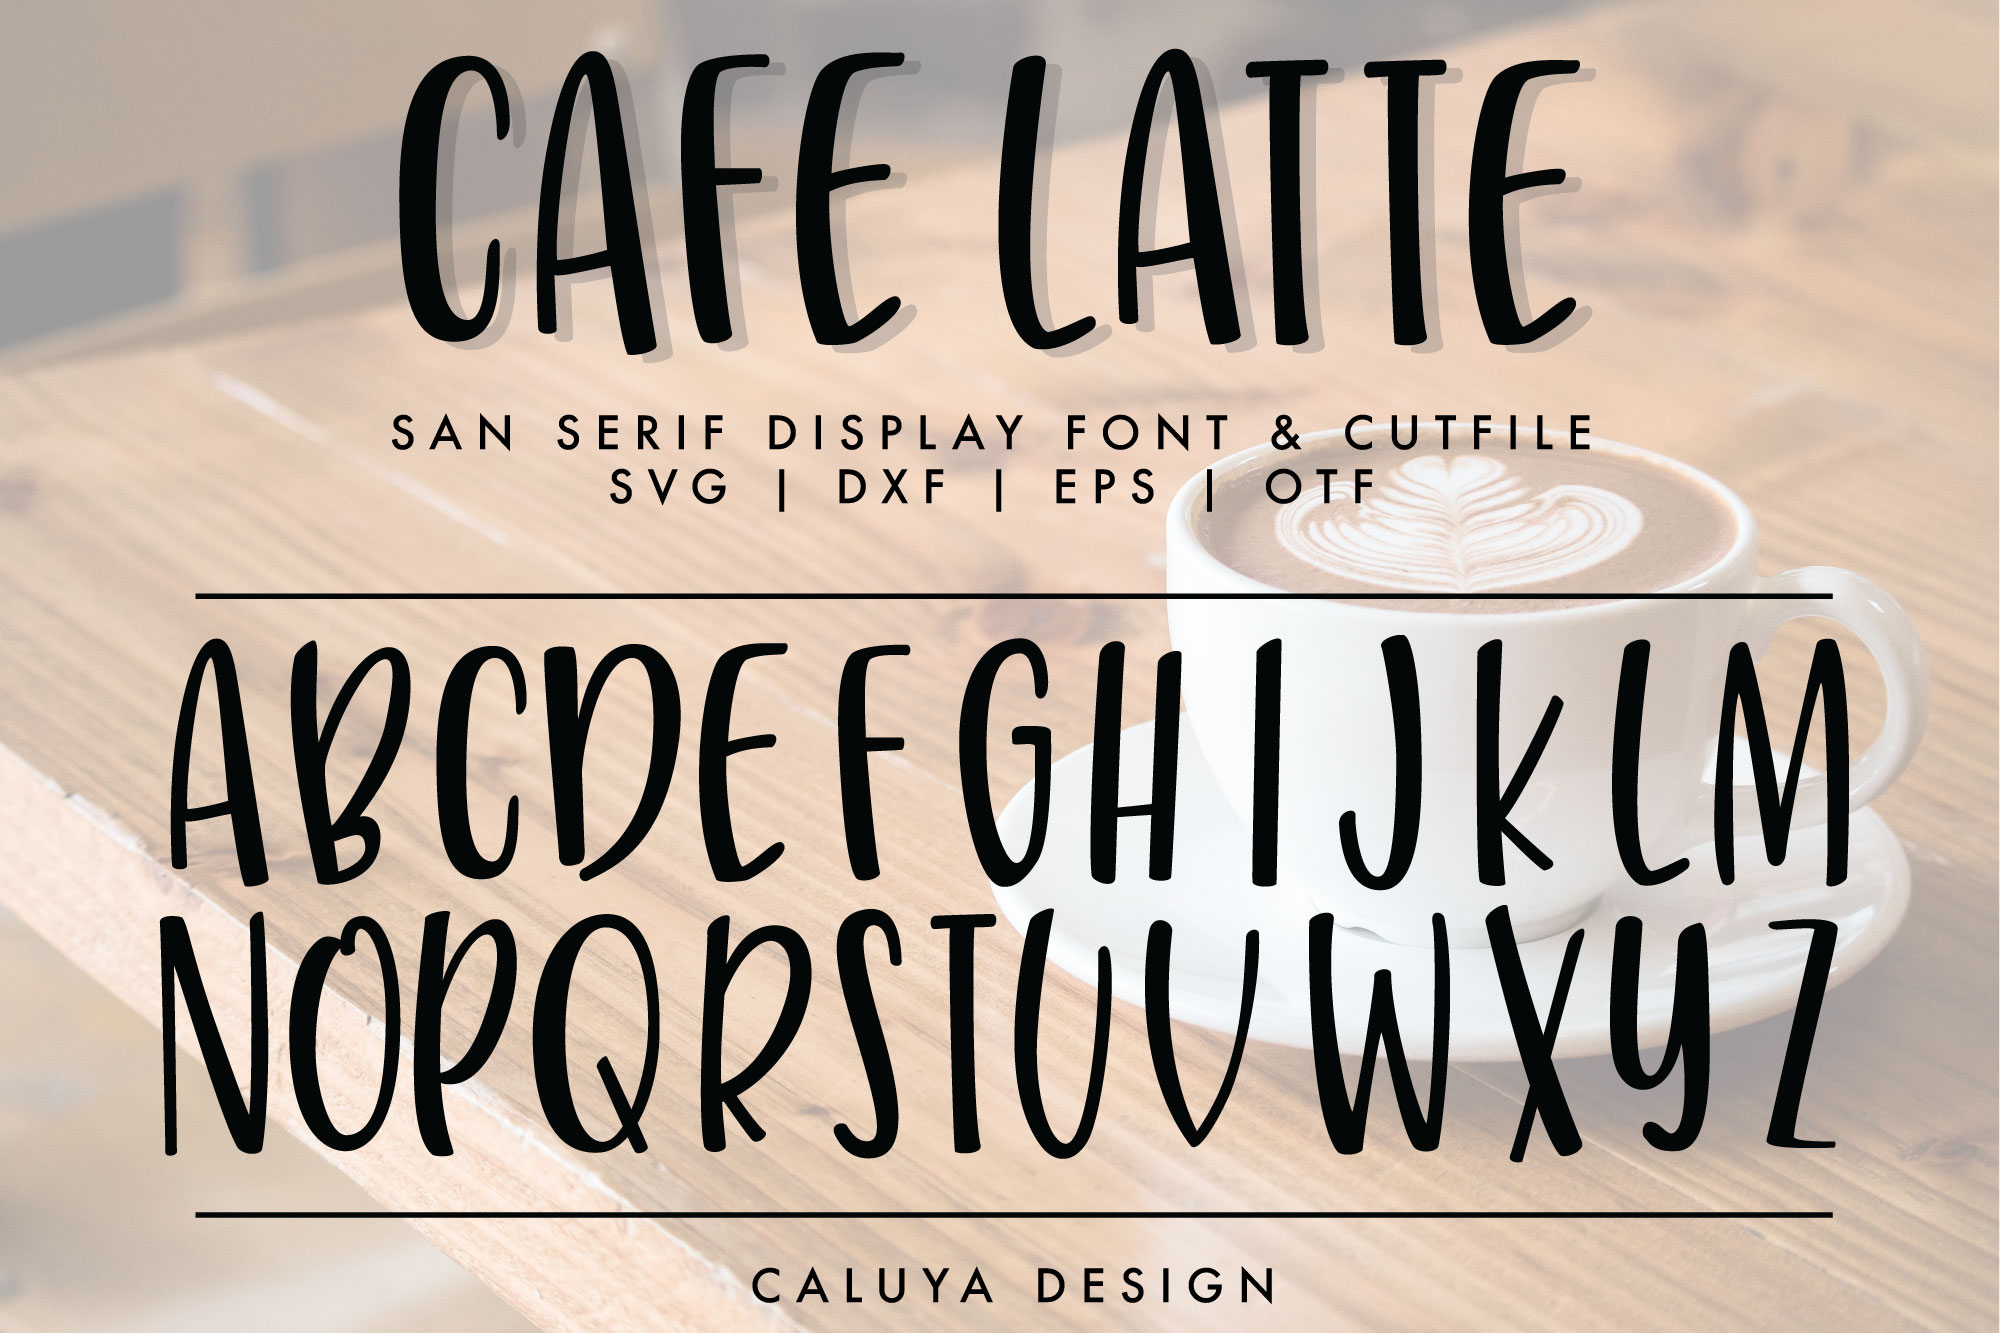 Handwritten San Serif Letters Cut File | SVG, DXF, OTF, TTF example image 1